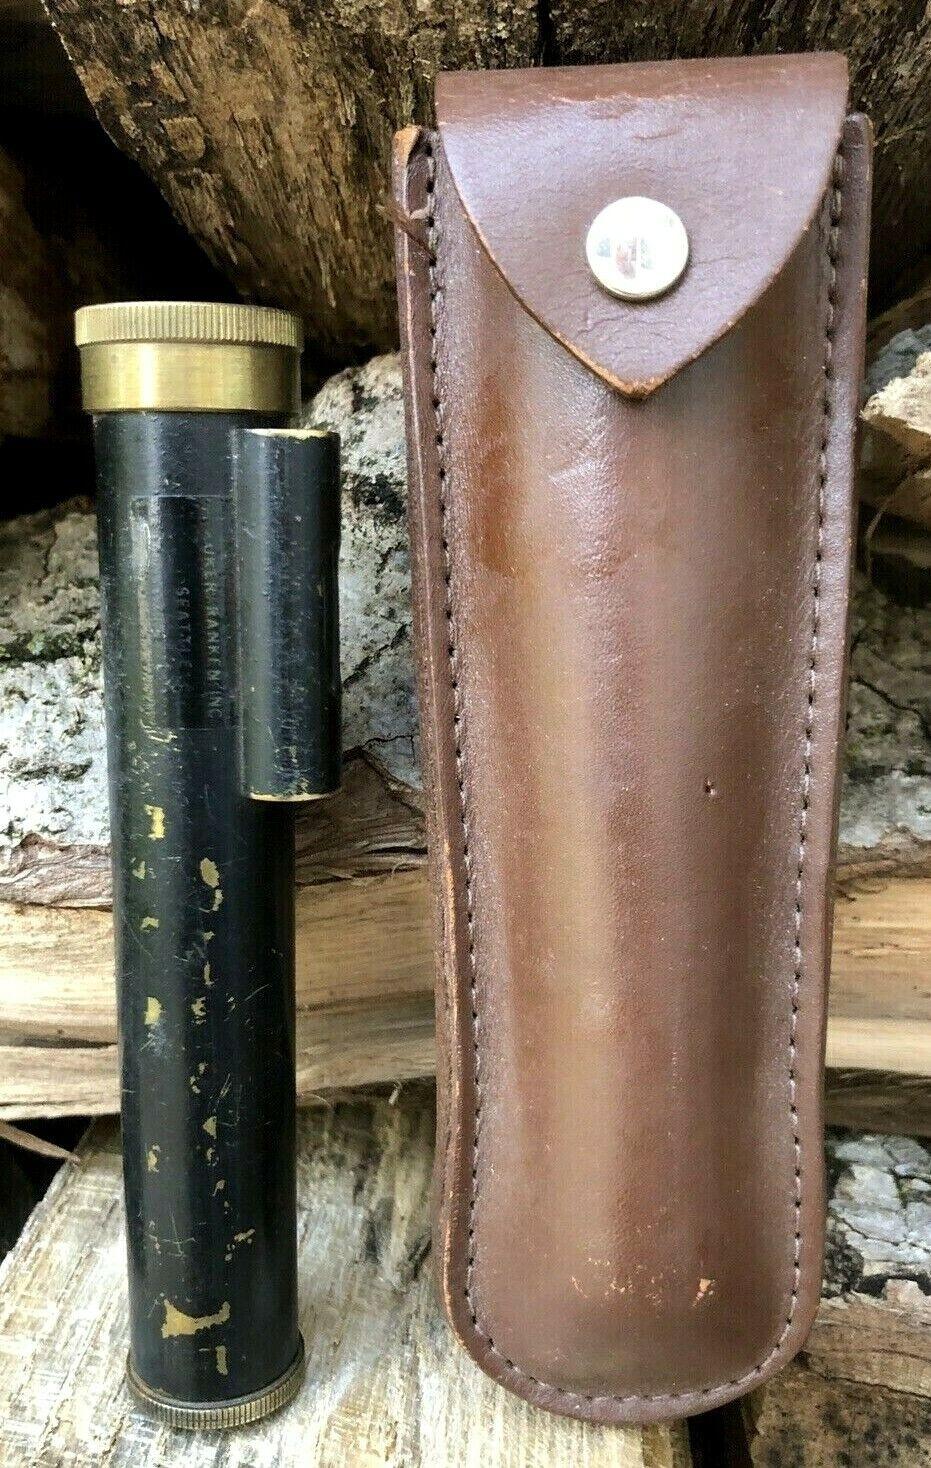 Vintage Kuker-Ranken Seattle Engineer Surveyor Hand Level Scope Tool Brass